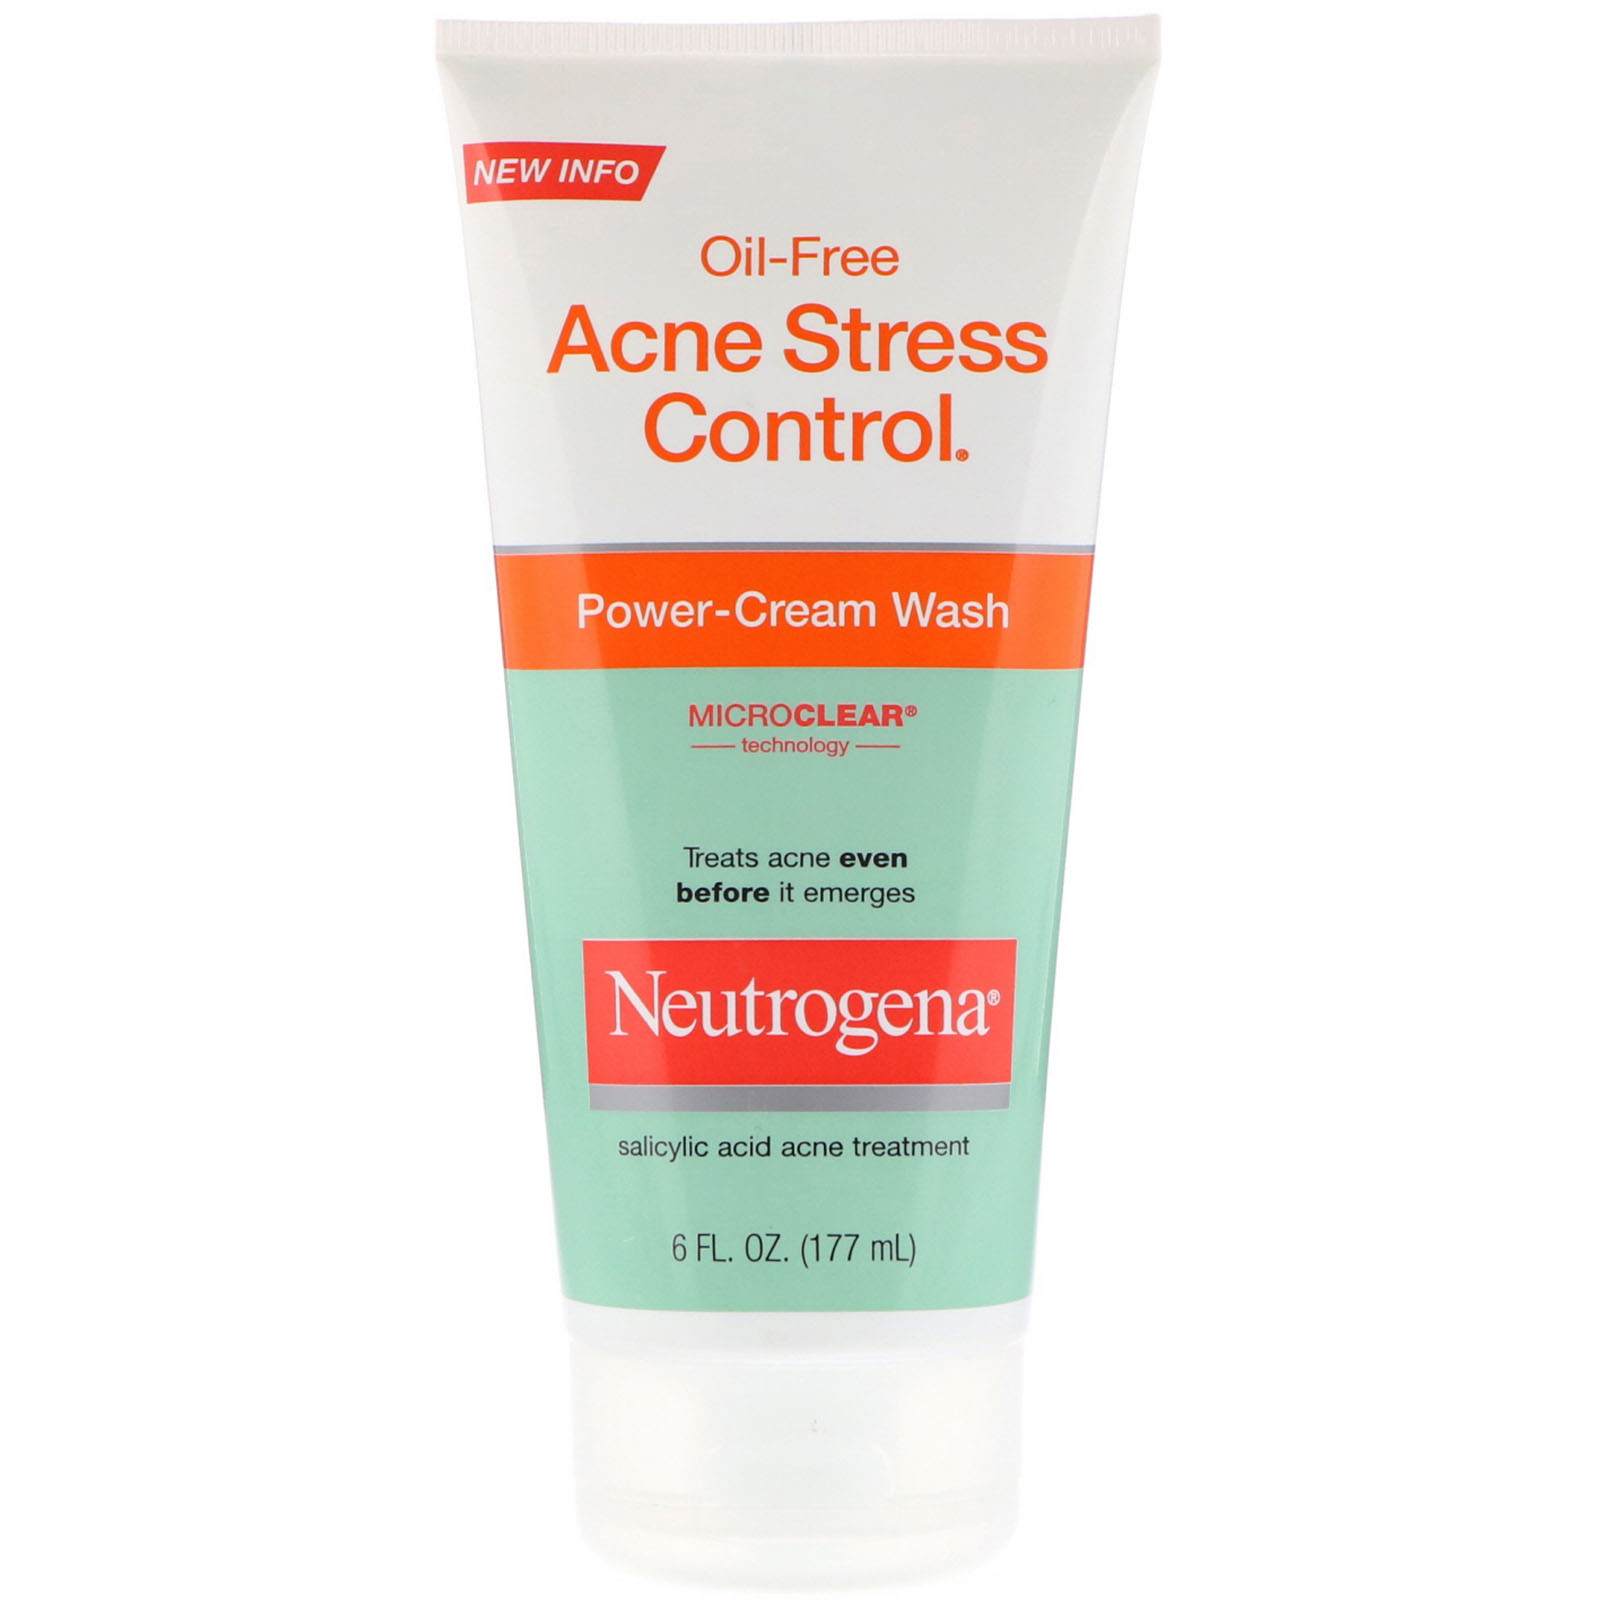 Neutrogena Oil Free Acne Stress Control Power Cream Wash 6 Fl